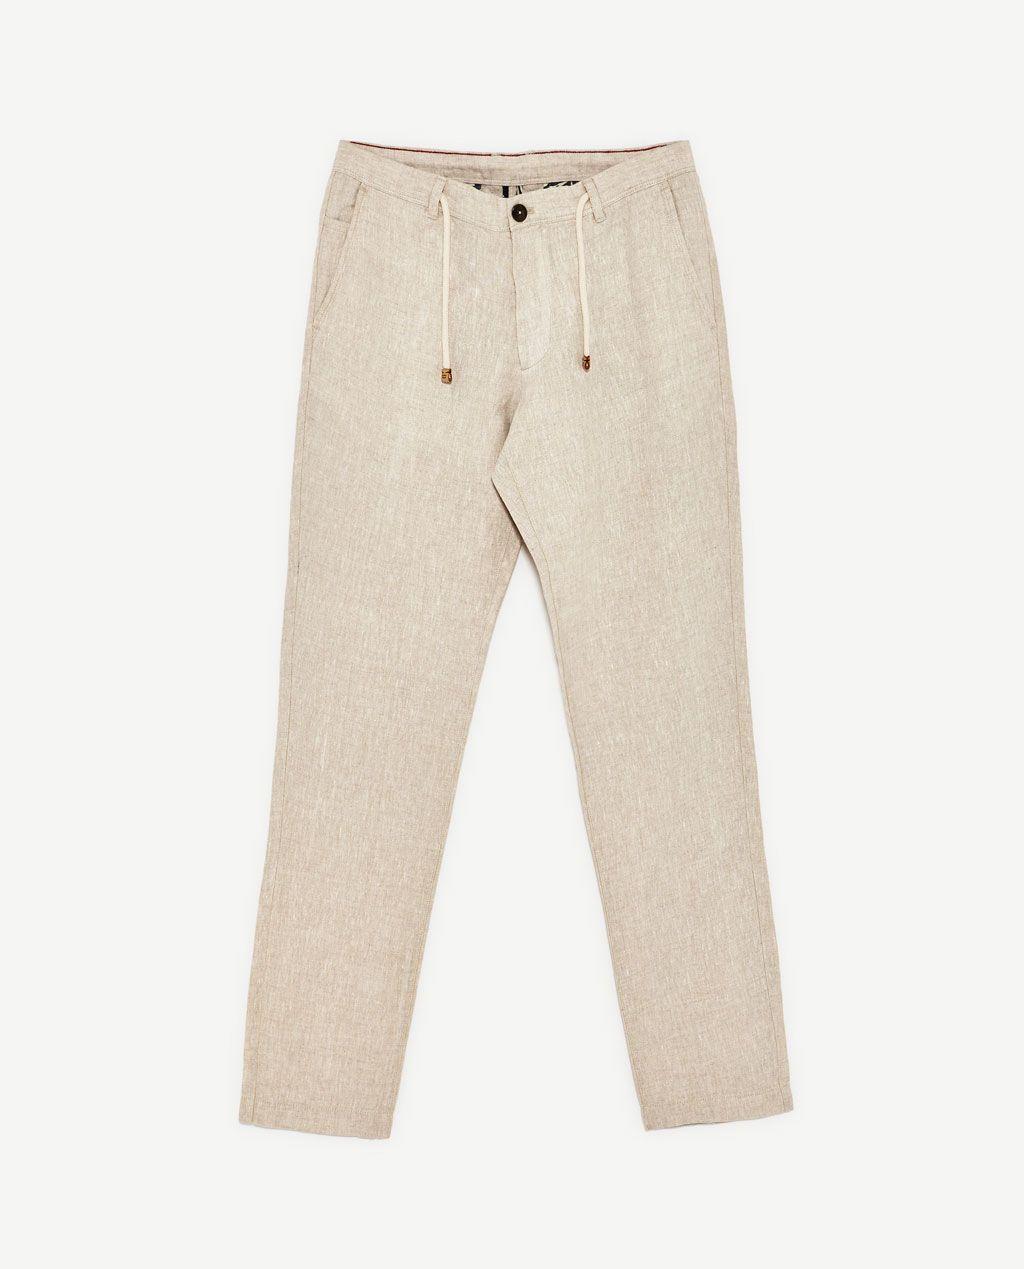 Imagen 6 De Pantalon Basico Lino De Zara Pantalones De Lino Hombre Ropa De Hombre Pantalones De Lino